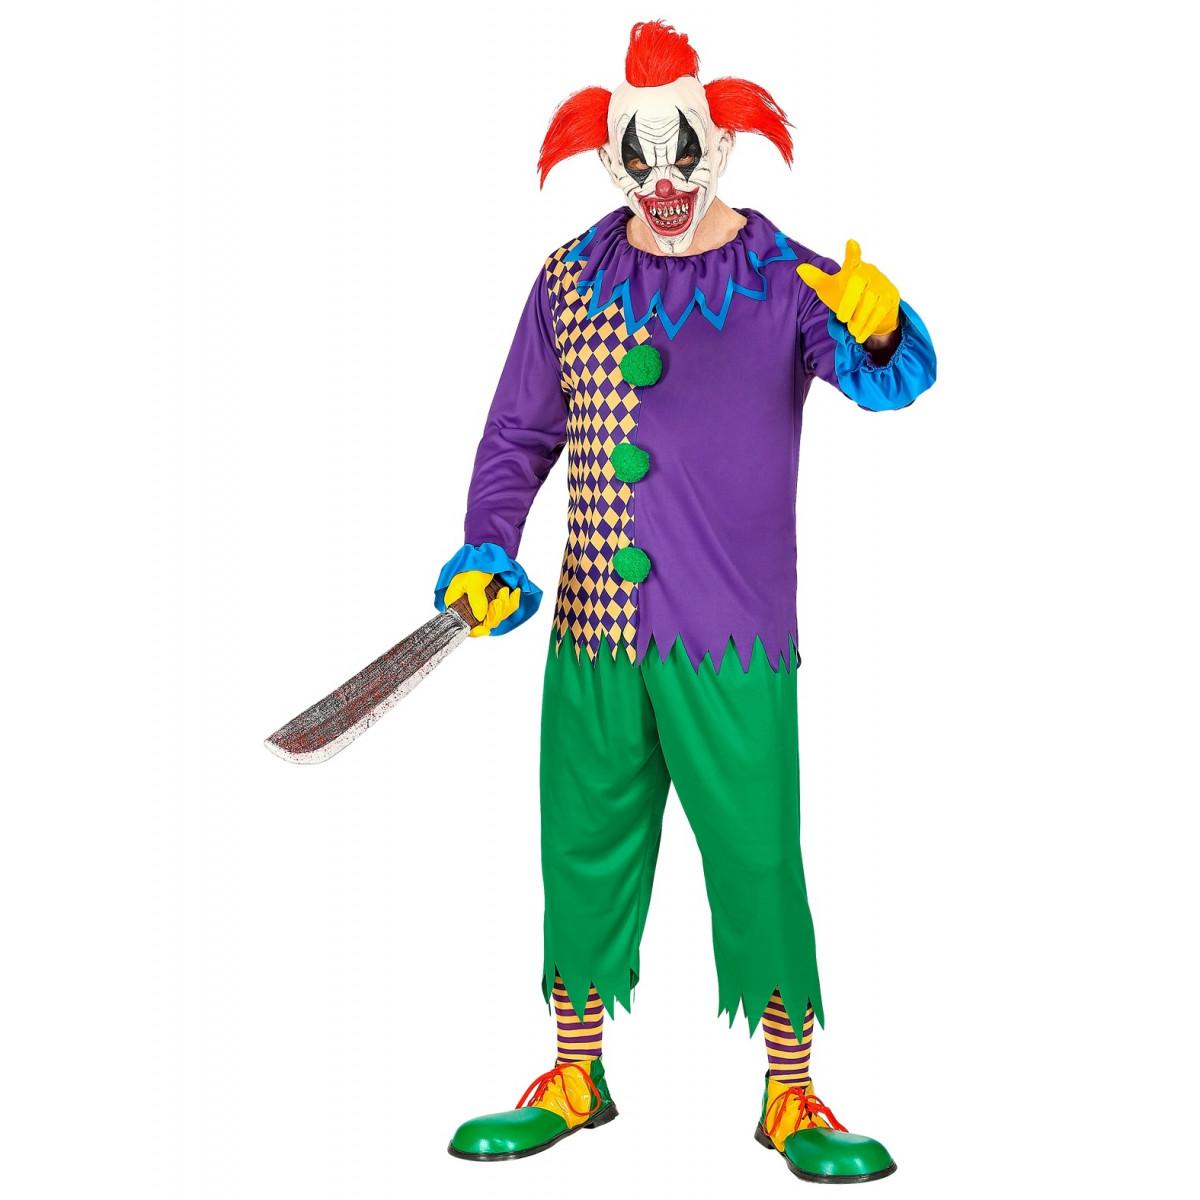 kostum Joker 0196